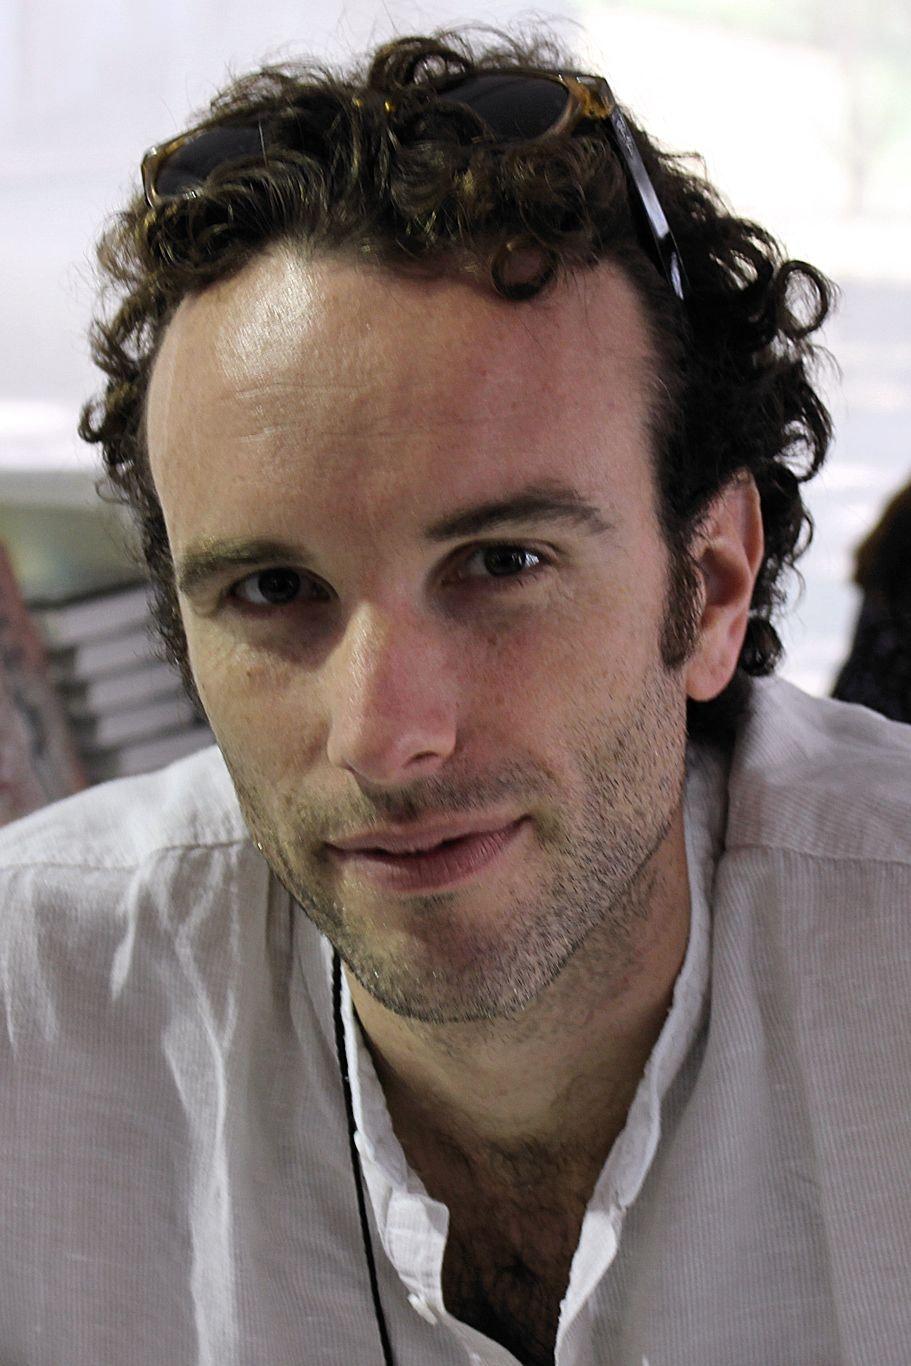 Elliot Ackerman